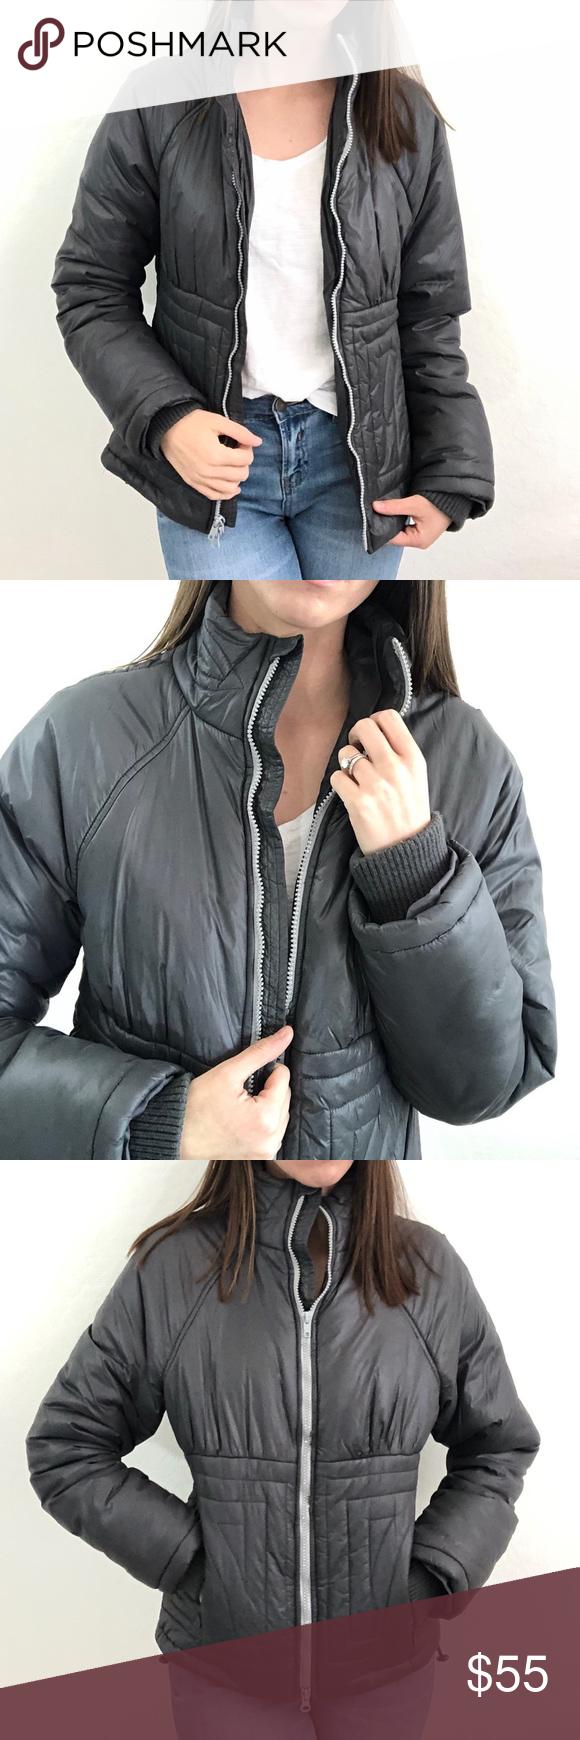 Athleta Puffer Jacket Jackets Clothes Design Puffer Jackets [ 1740 x 580 Pixel ]